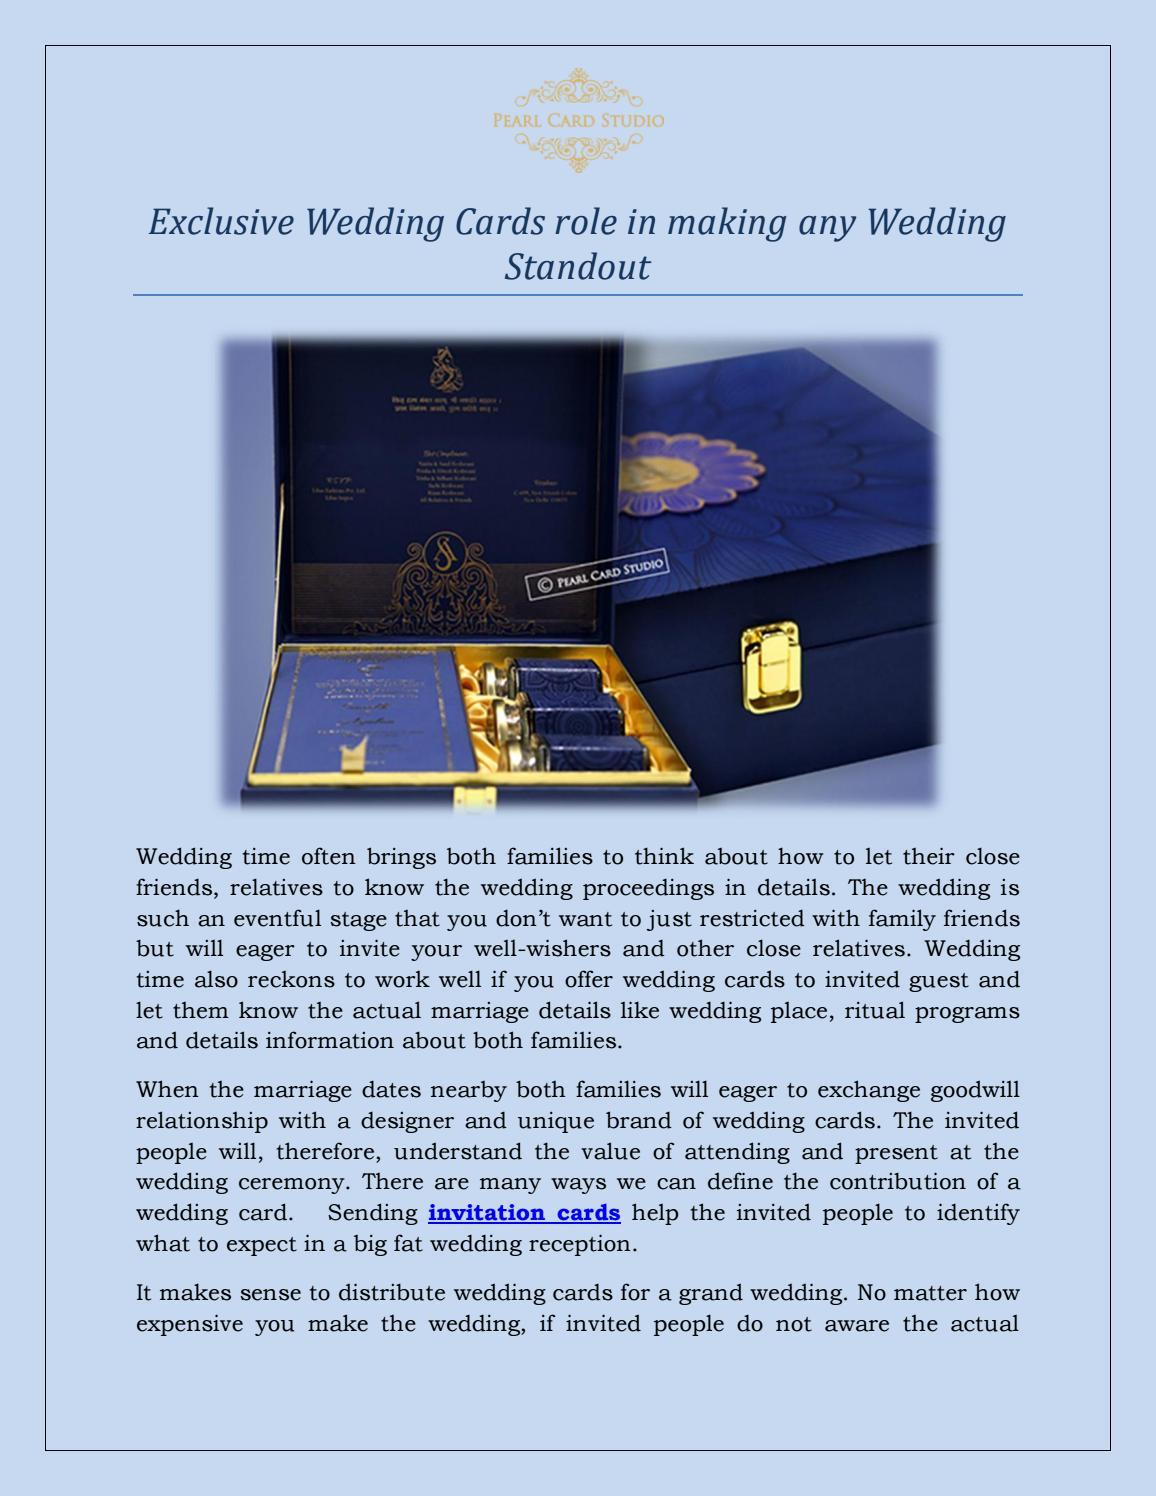 Exclusive Wedding Card Delhi By Pearlcardstudio Issuu